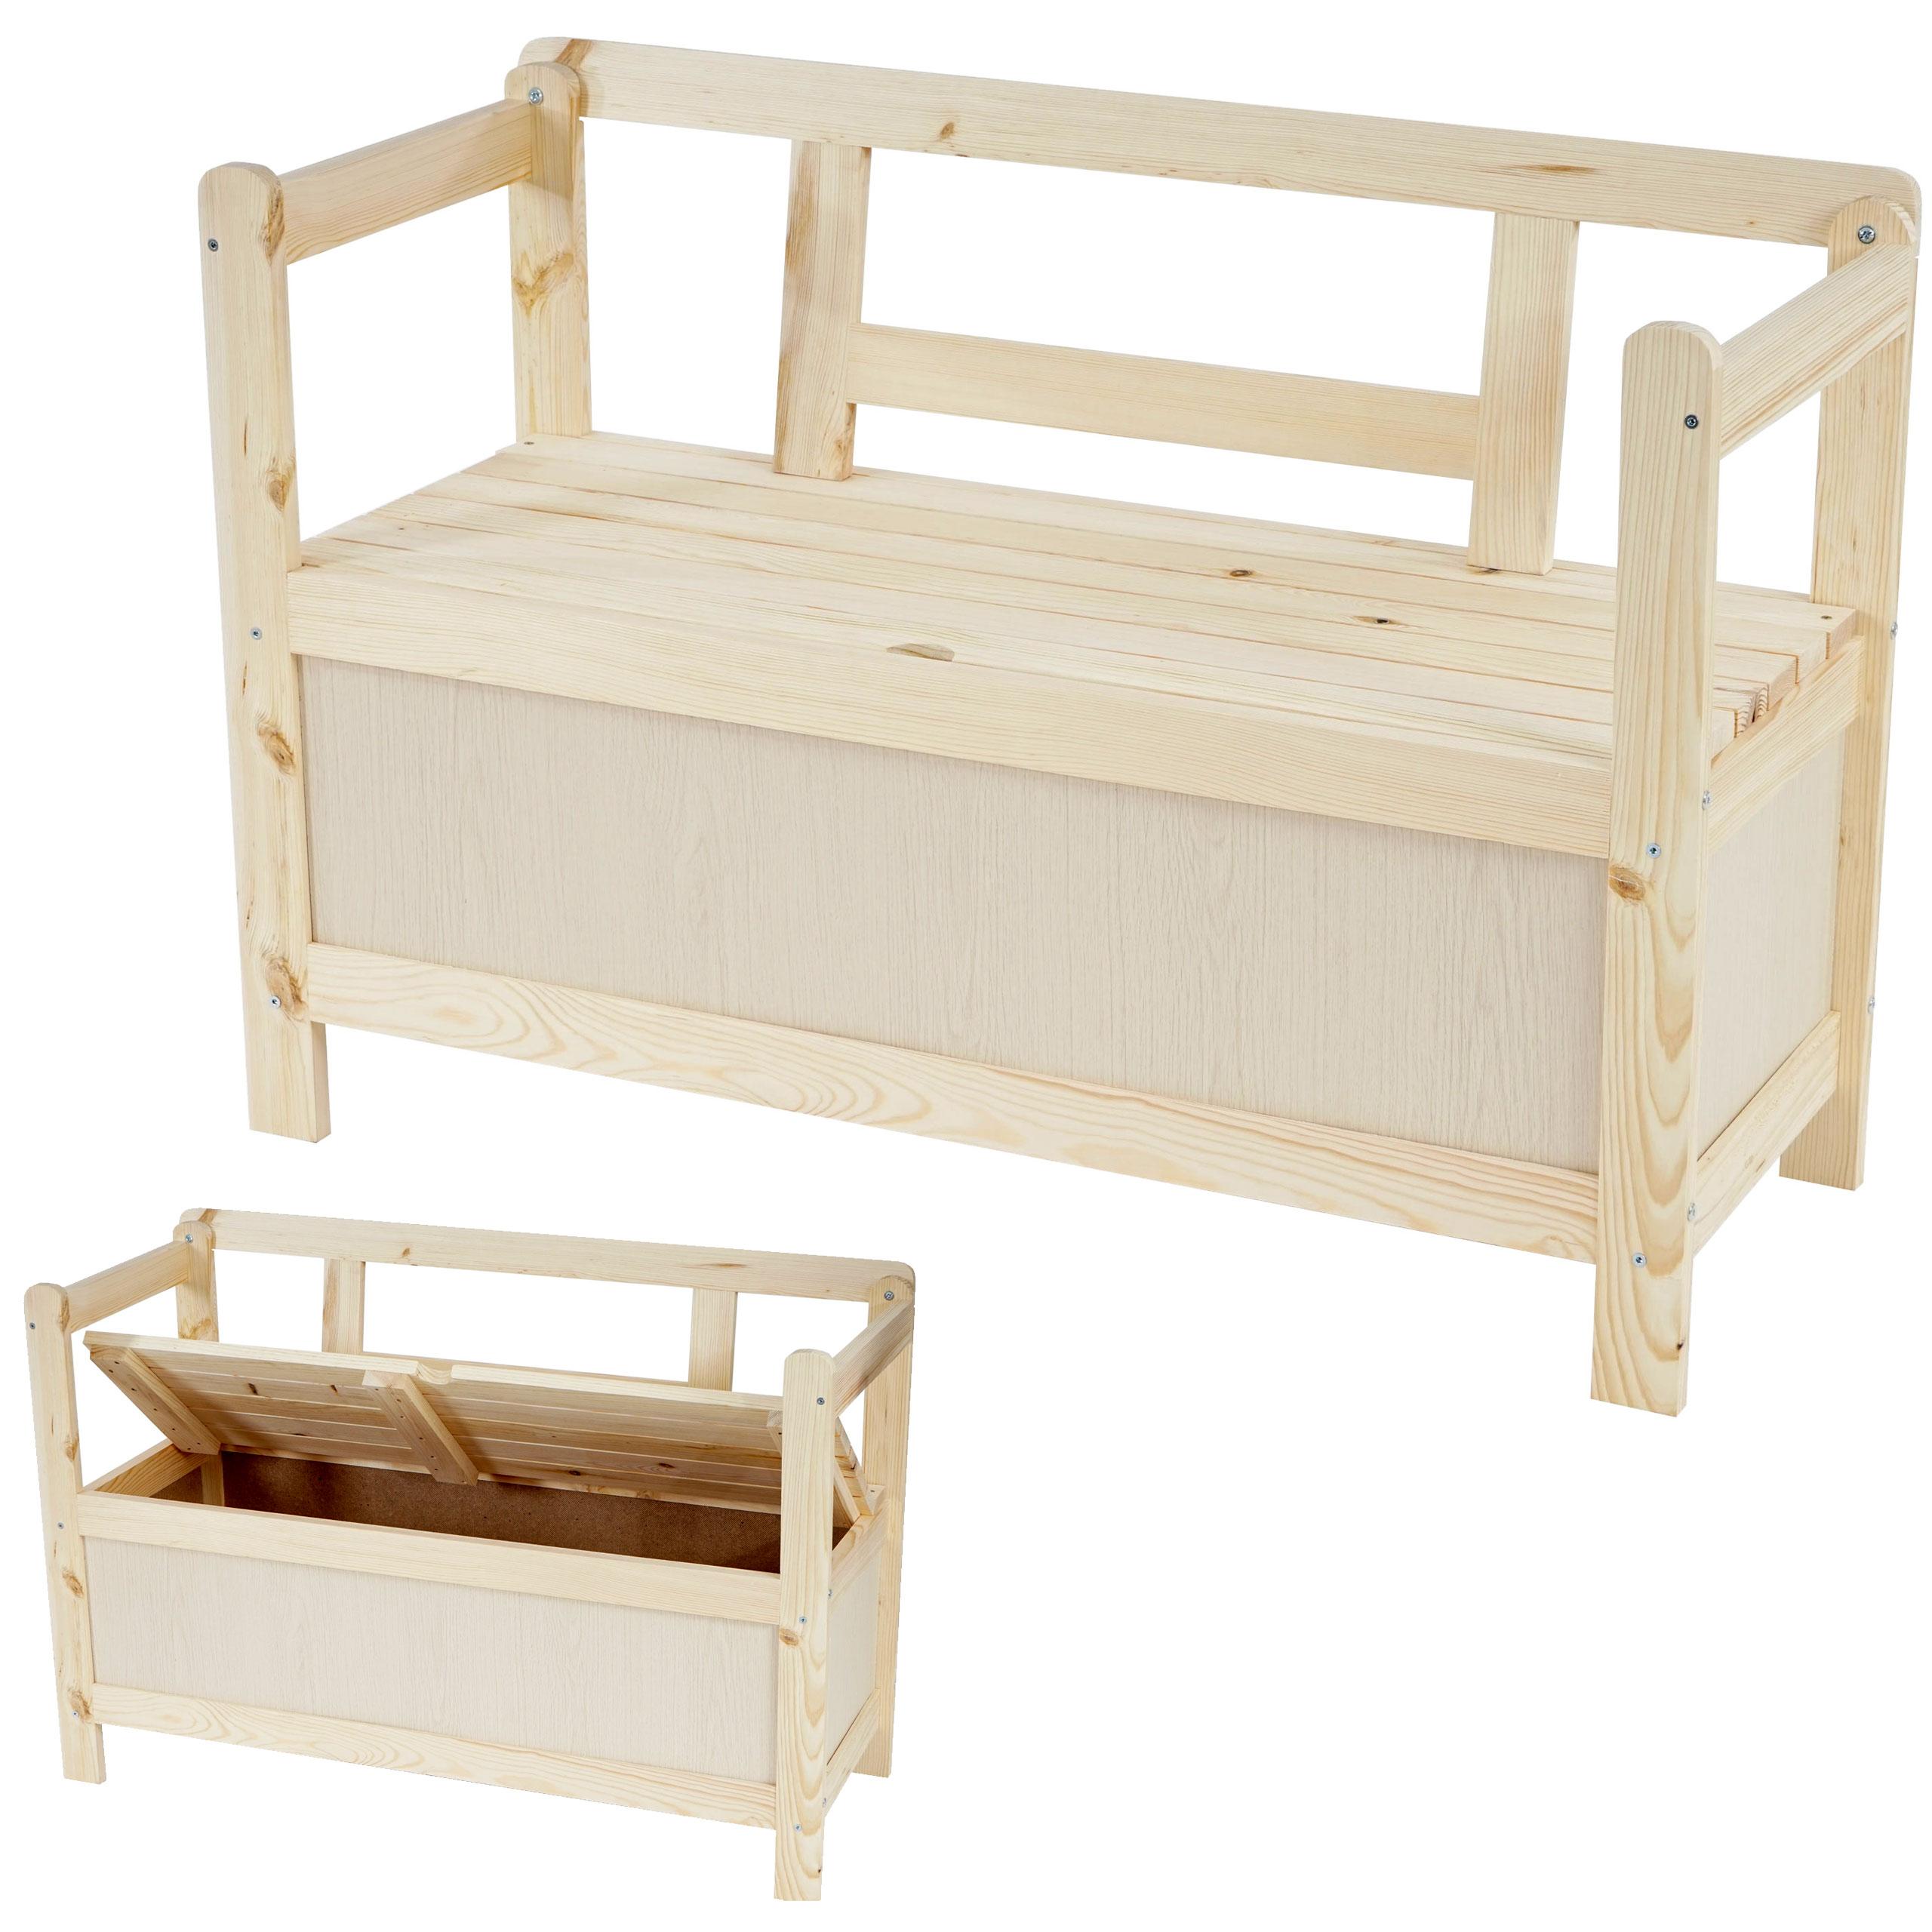 holzbank truhenbank gartenbank friesenbank kastenbank. Black Bedroom Furniture Sets. Home Design Ideas